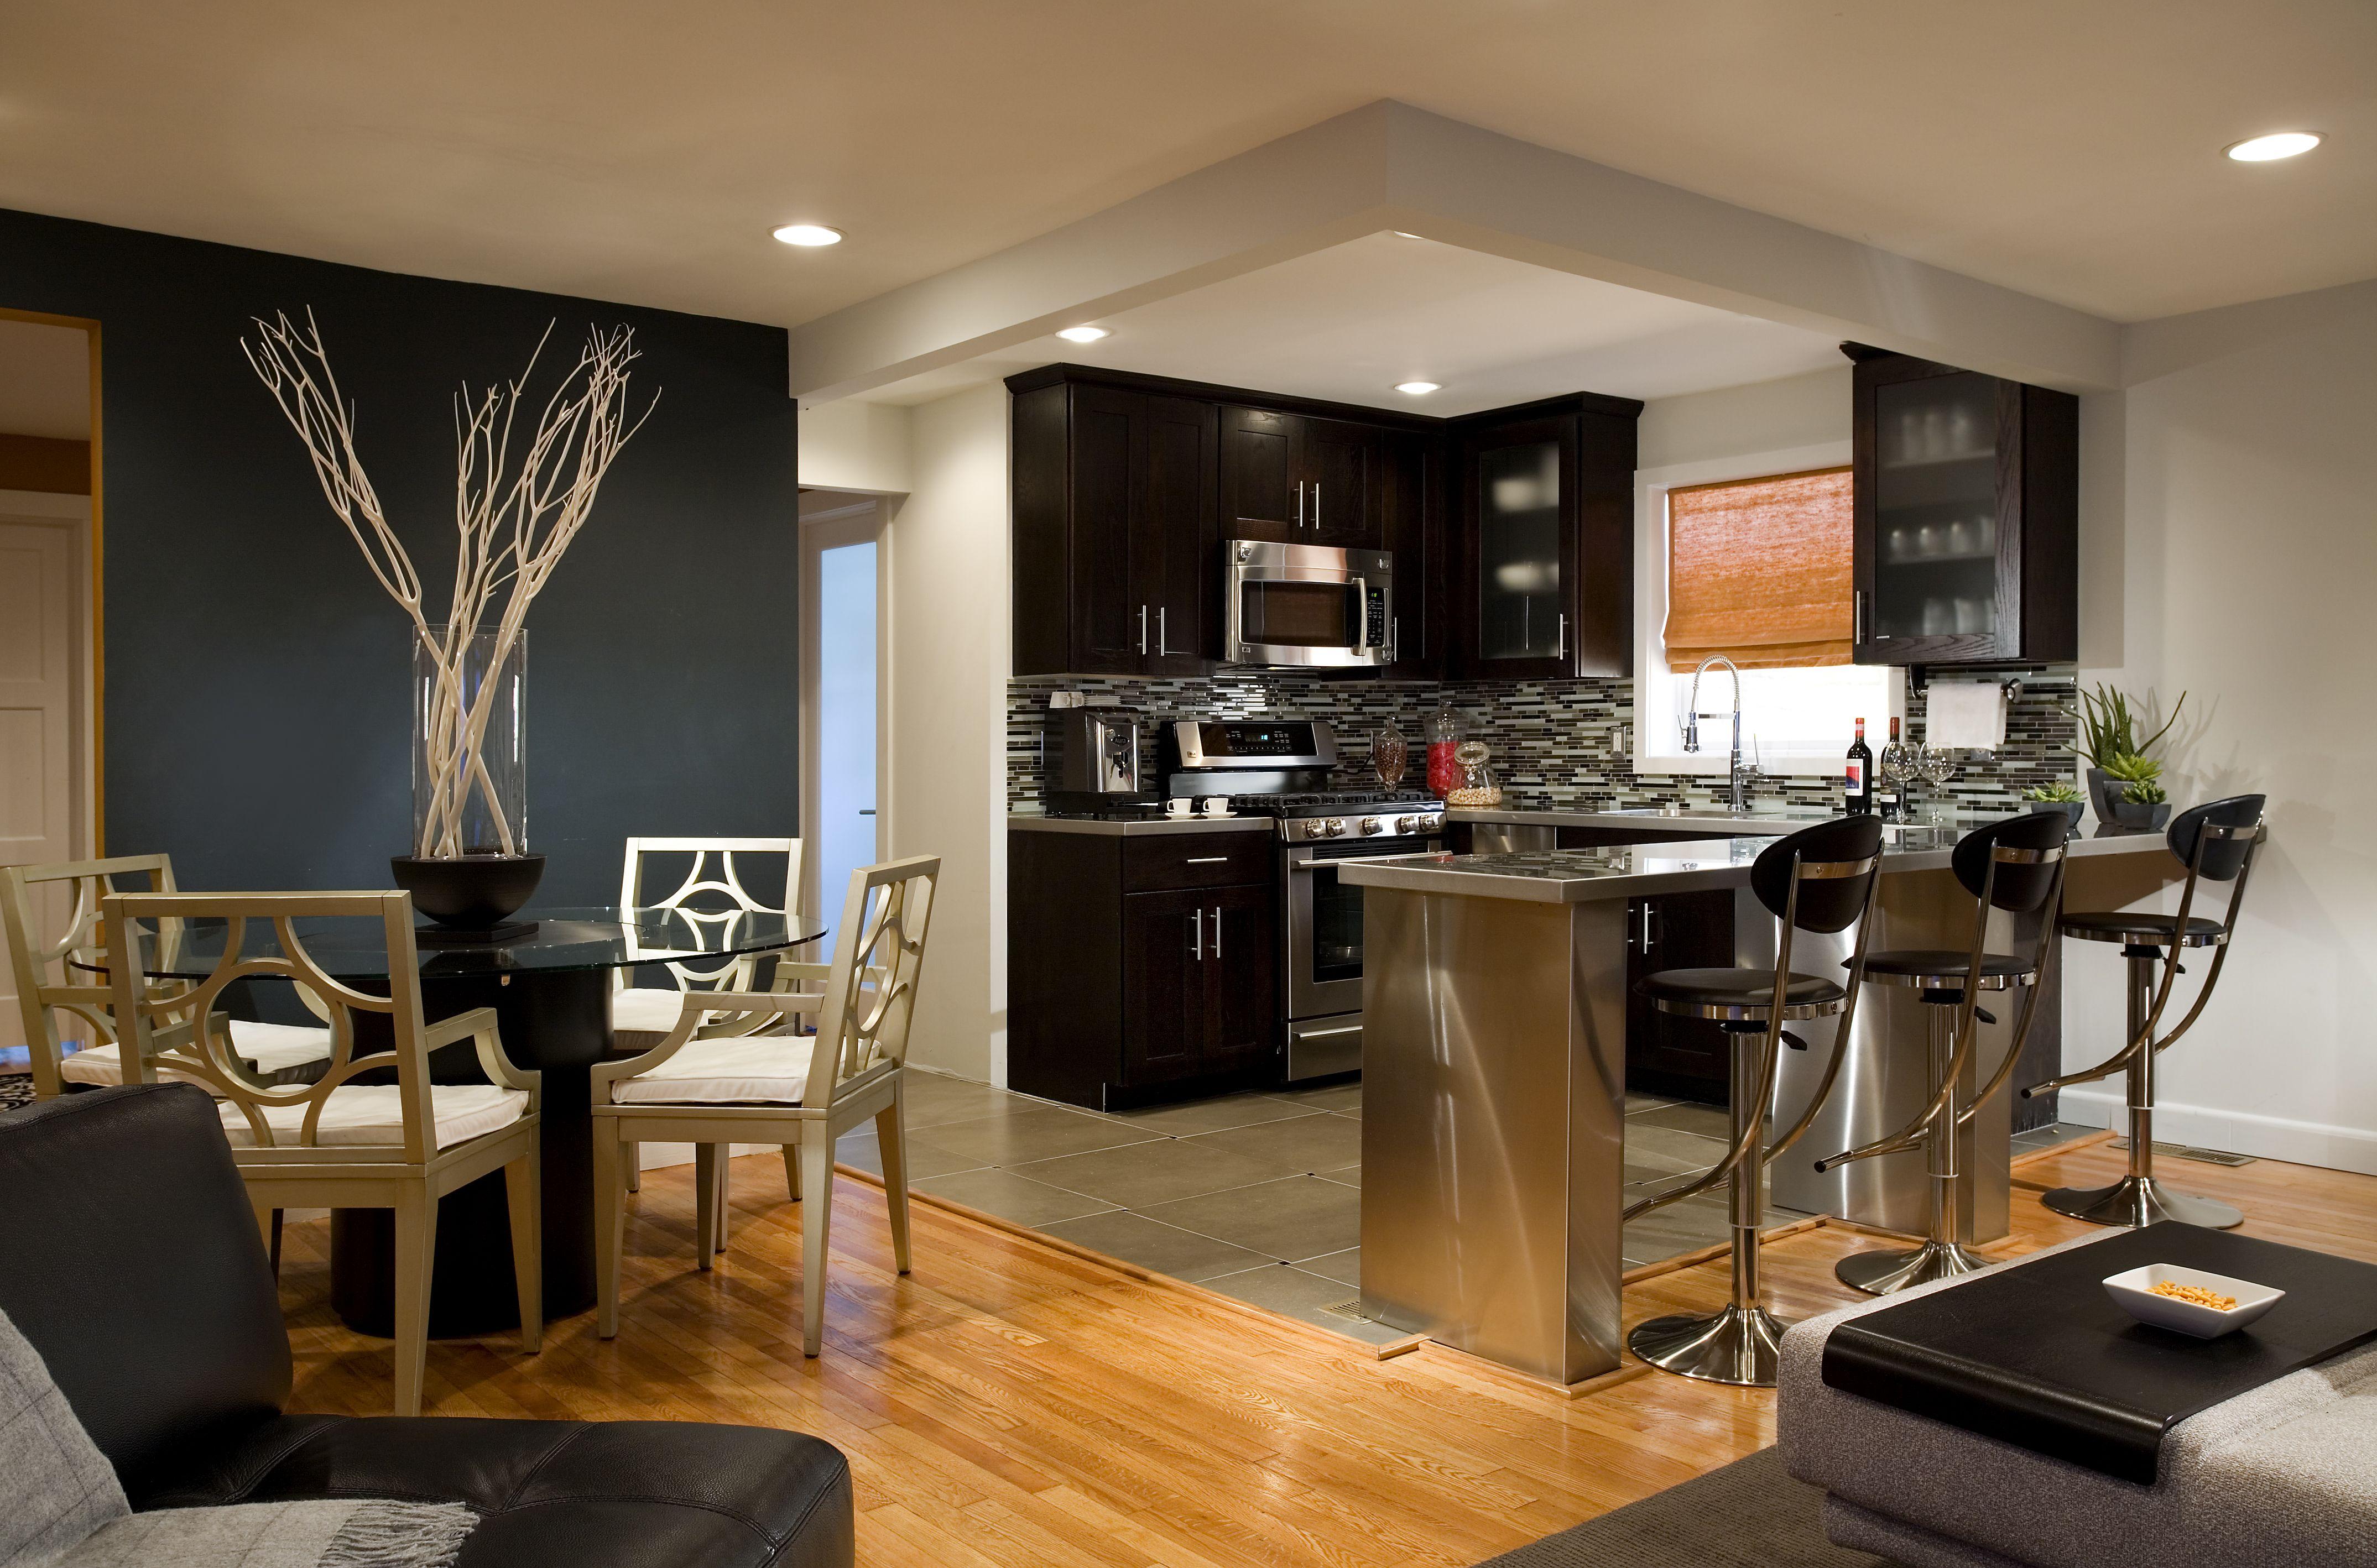 Kitchen Designers Nj Alluring Pinblanche Garcia On Bgarcia Designs  Pinterest  Apartment Inspiration